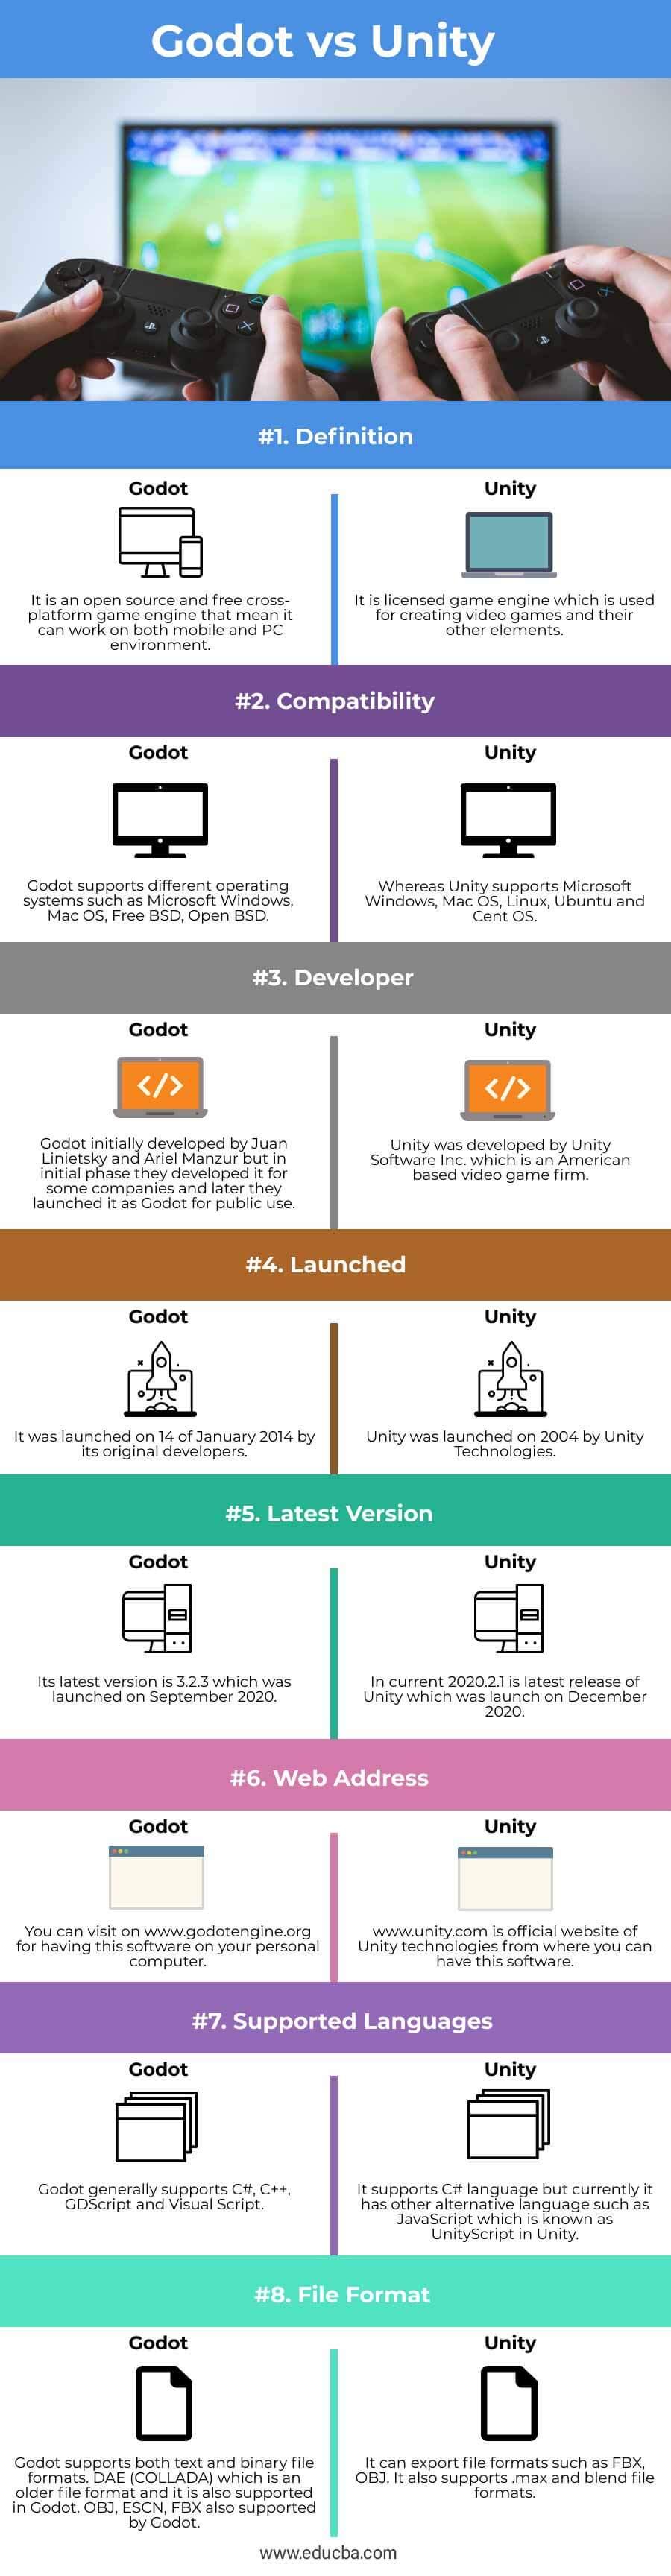 Godot-vs-Unity-info